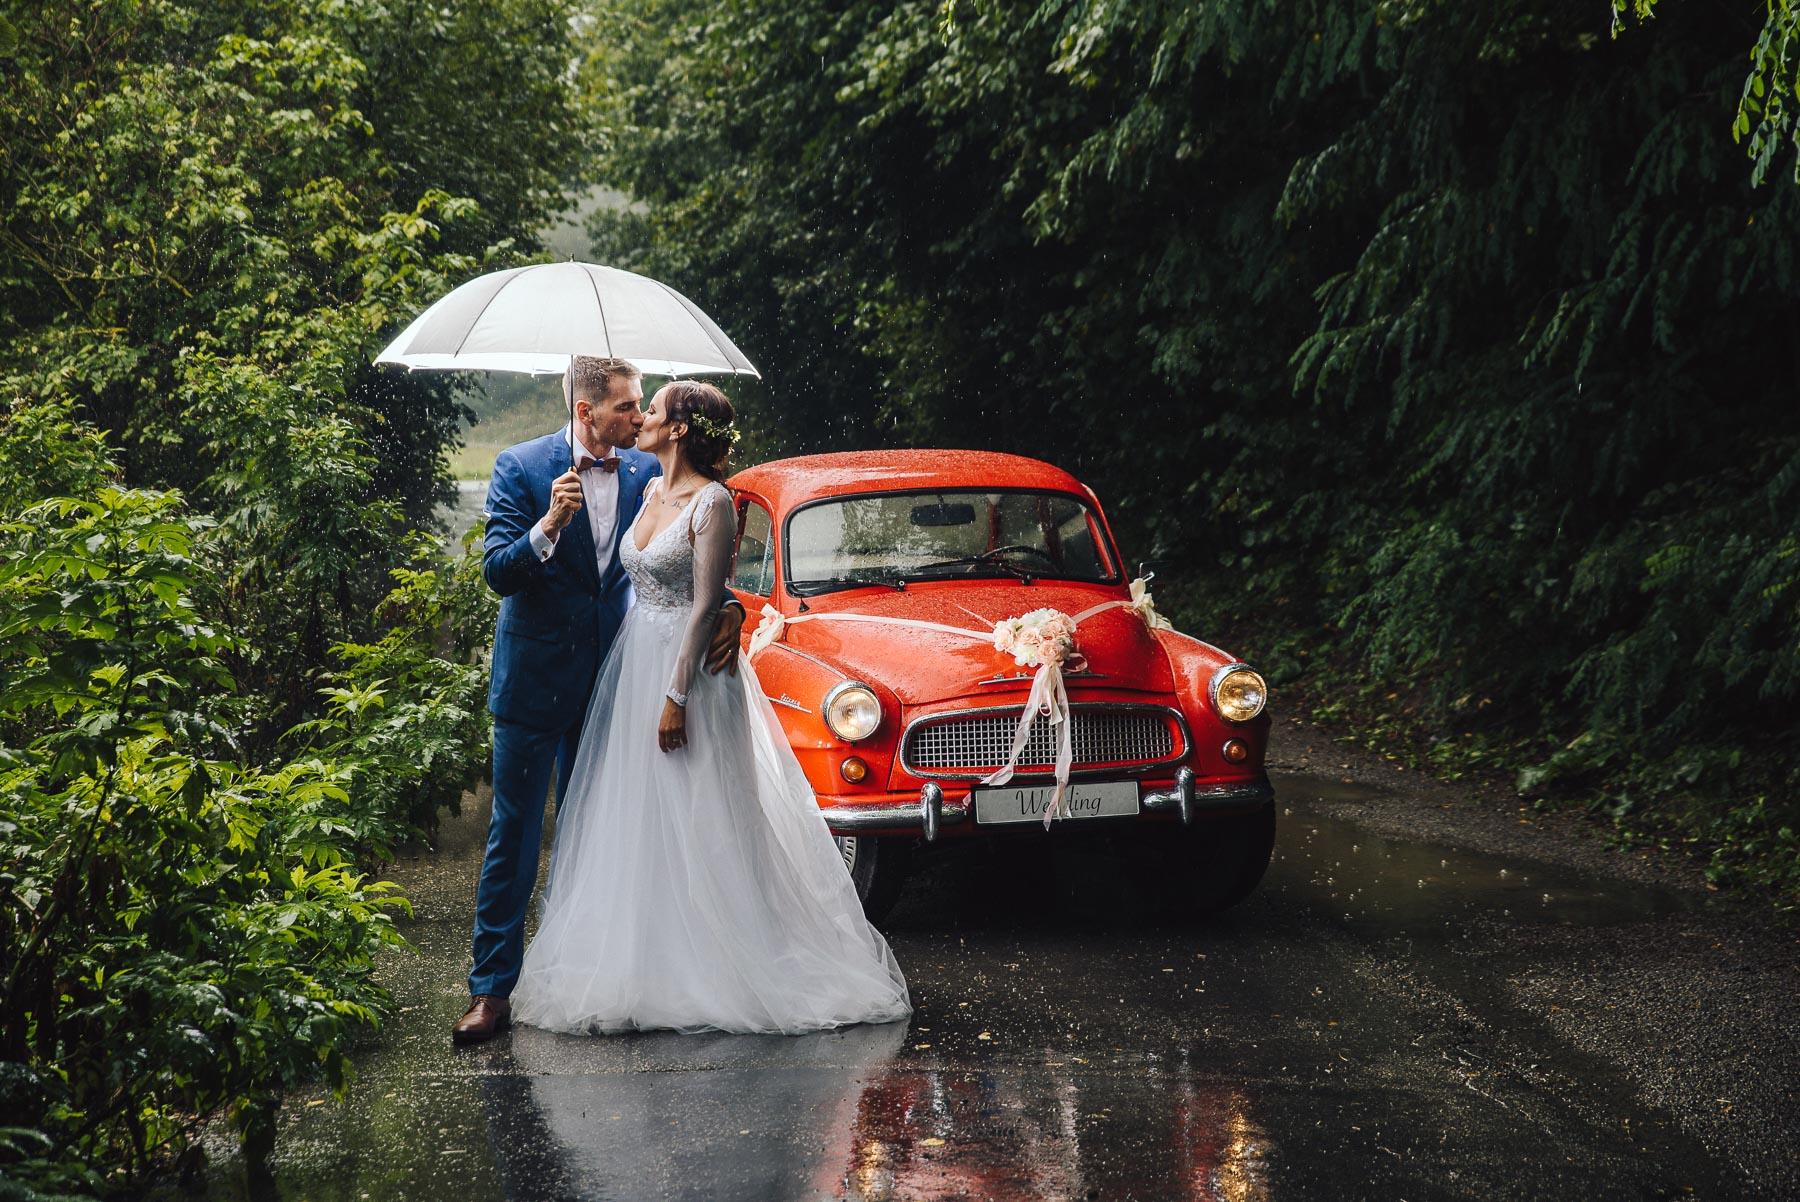 svatba Brno - svatební fotograf Brno